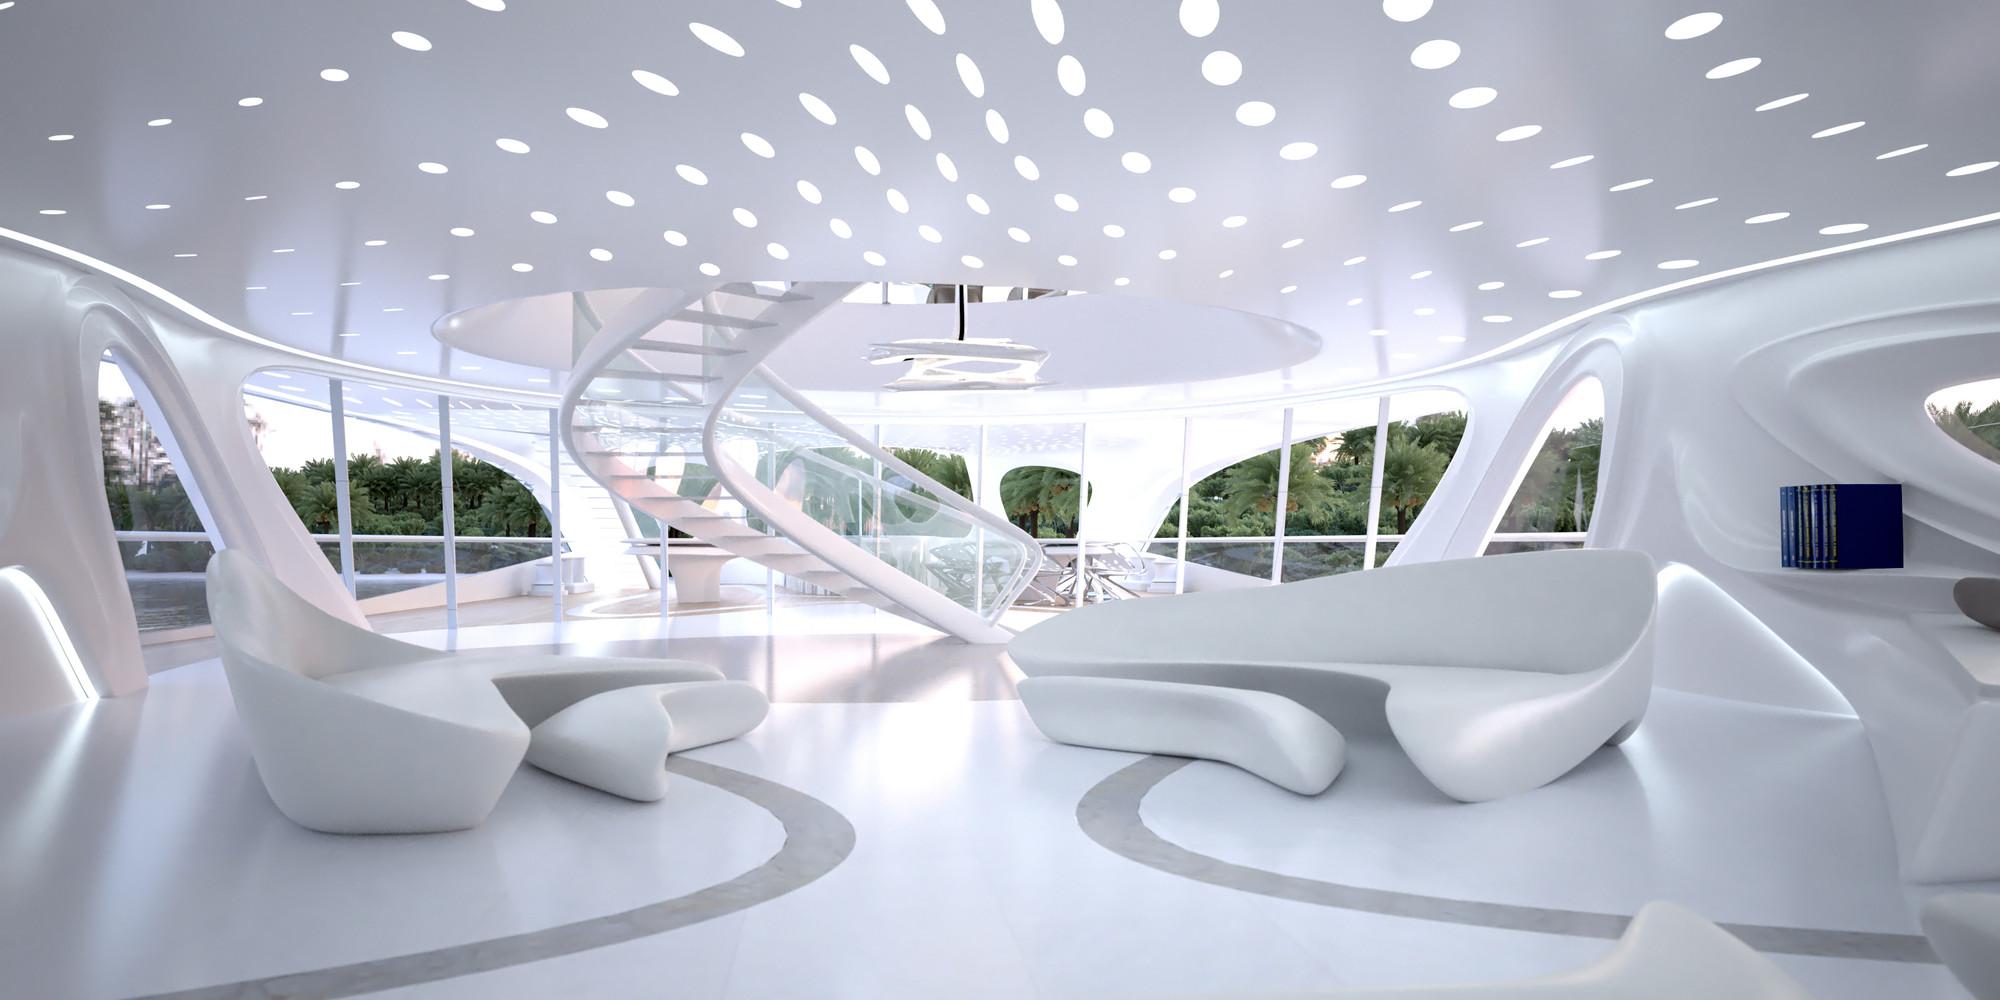 Zaha Hadid Designs Superyacht ArchDaily